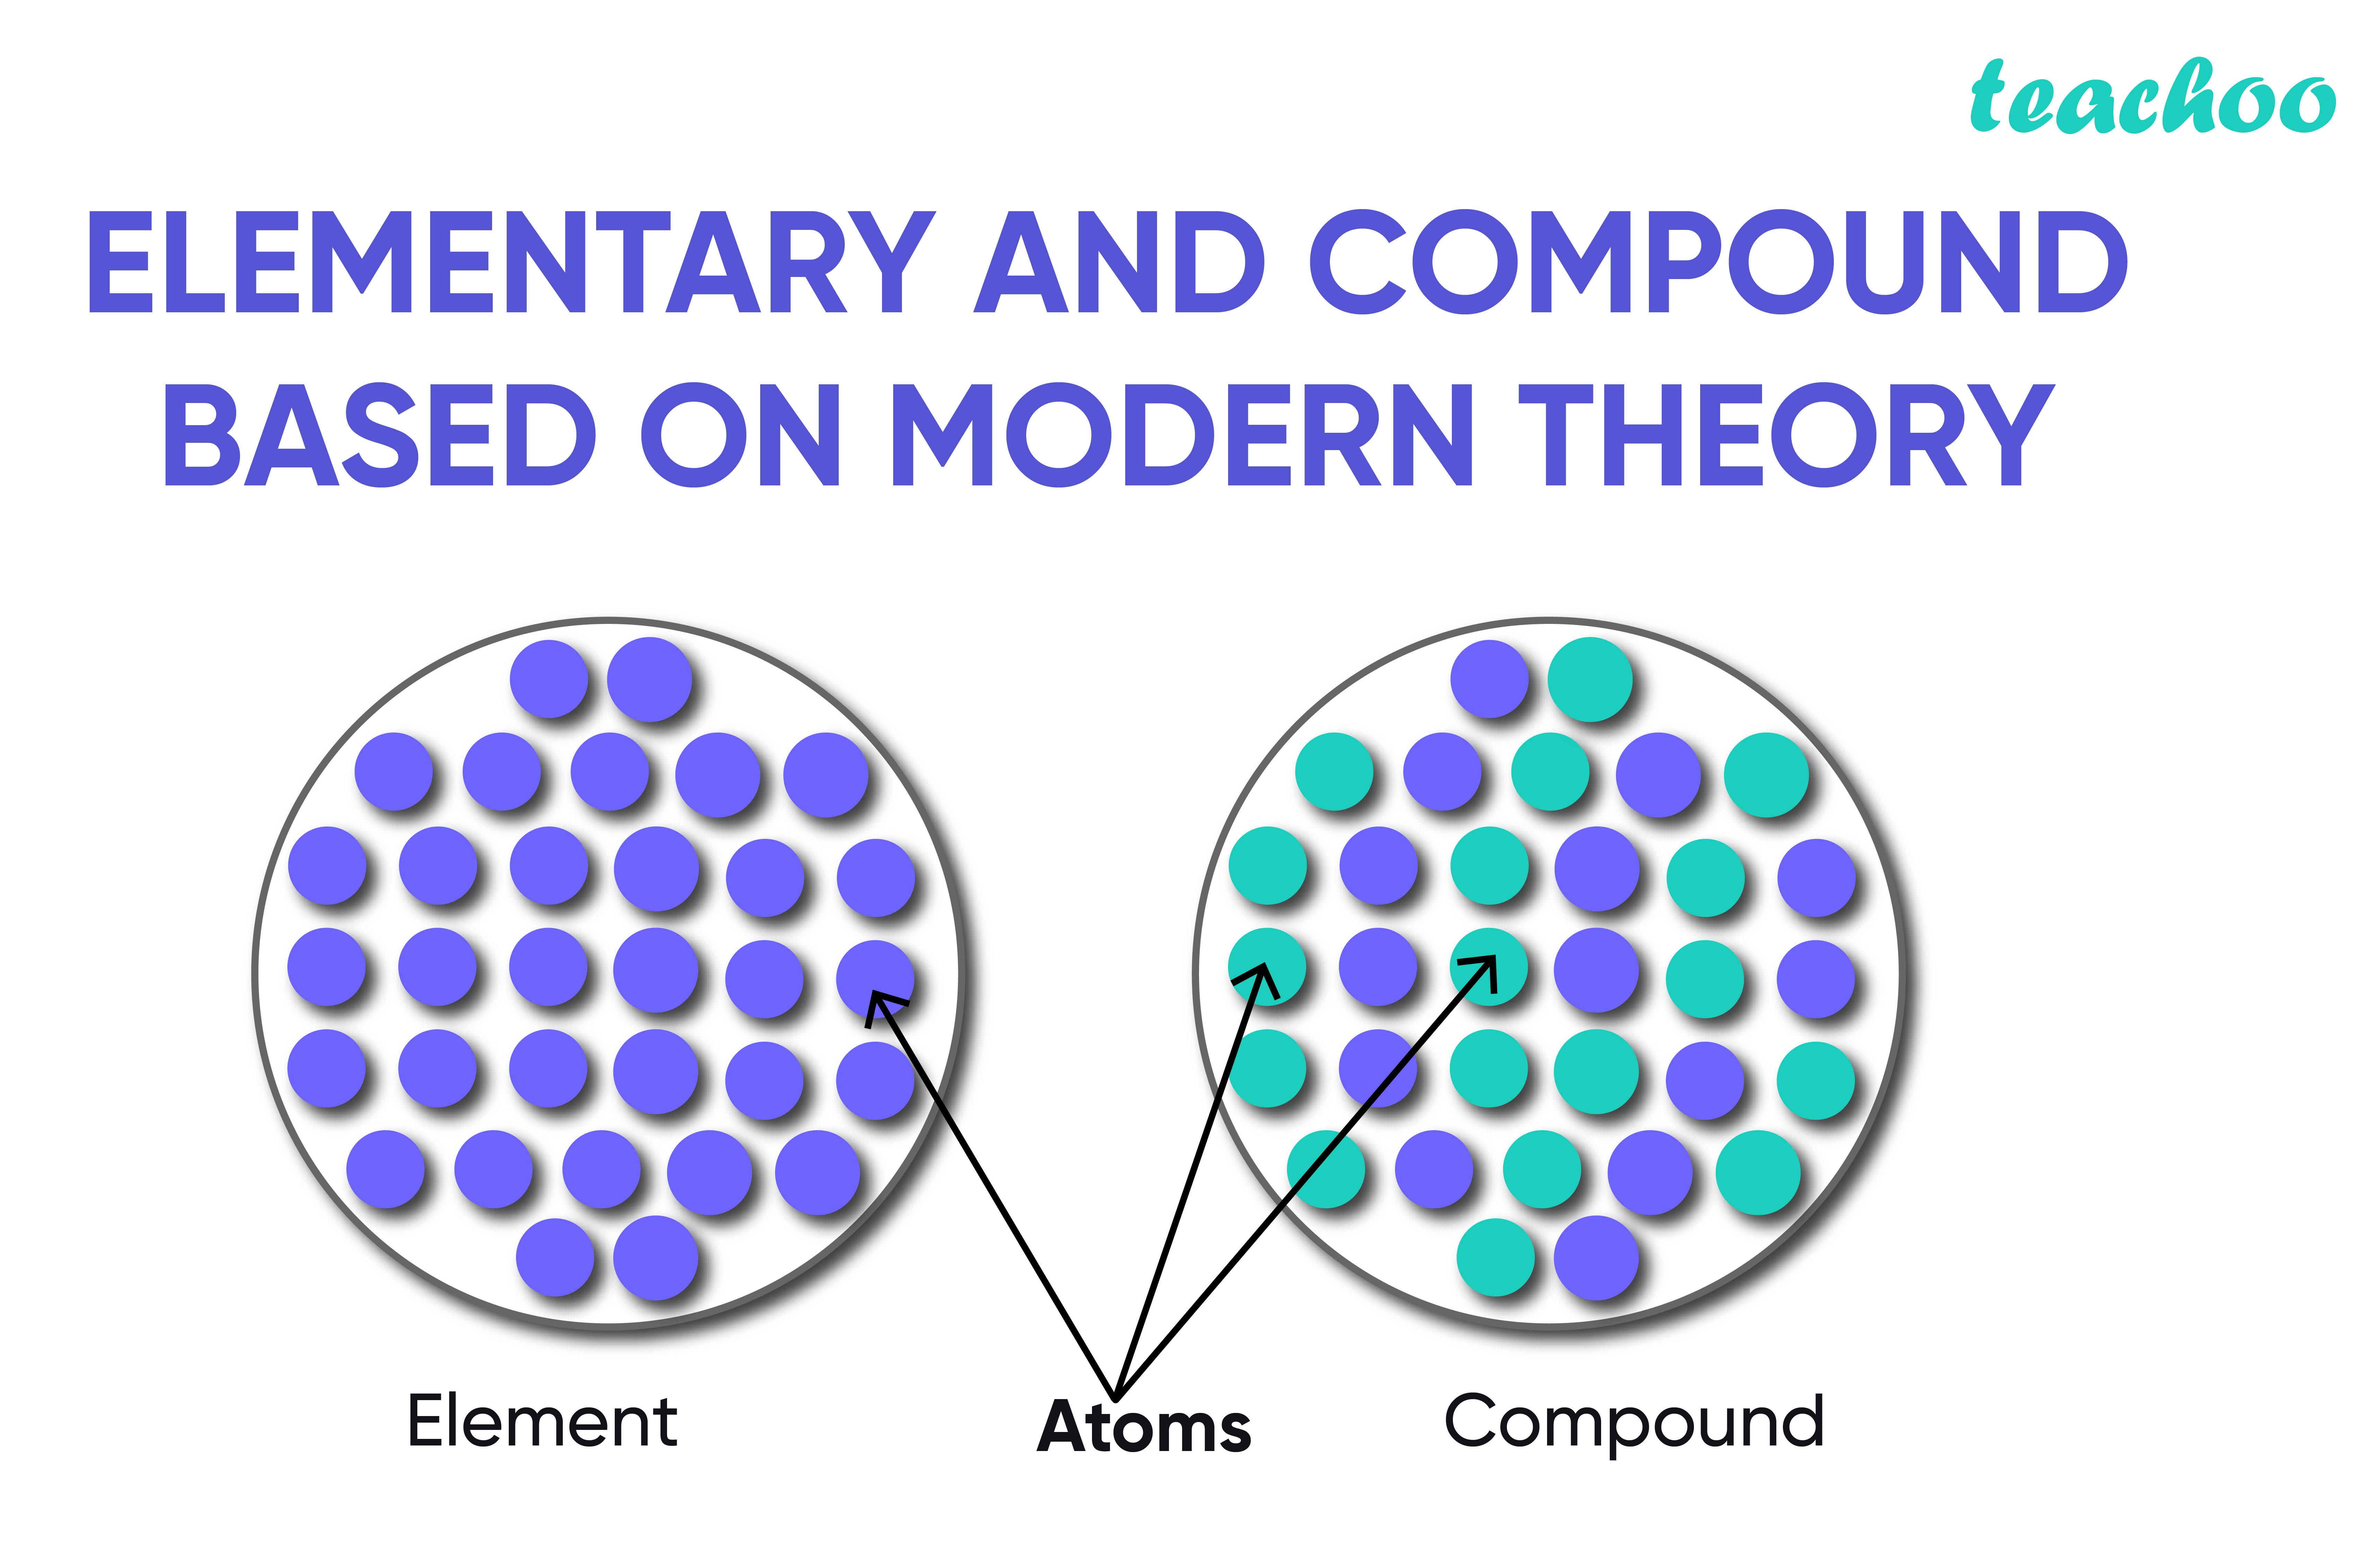 Elementary and Compound based on modern theory-Teachoo-01.jpg